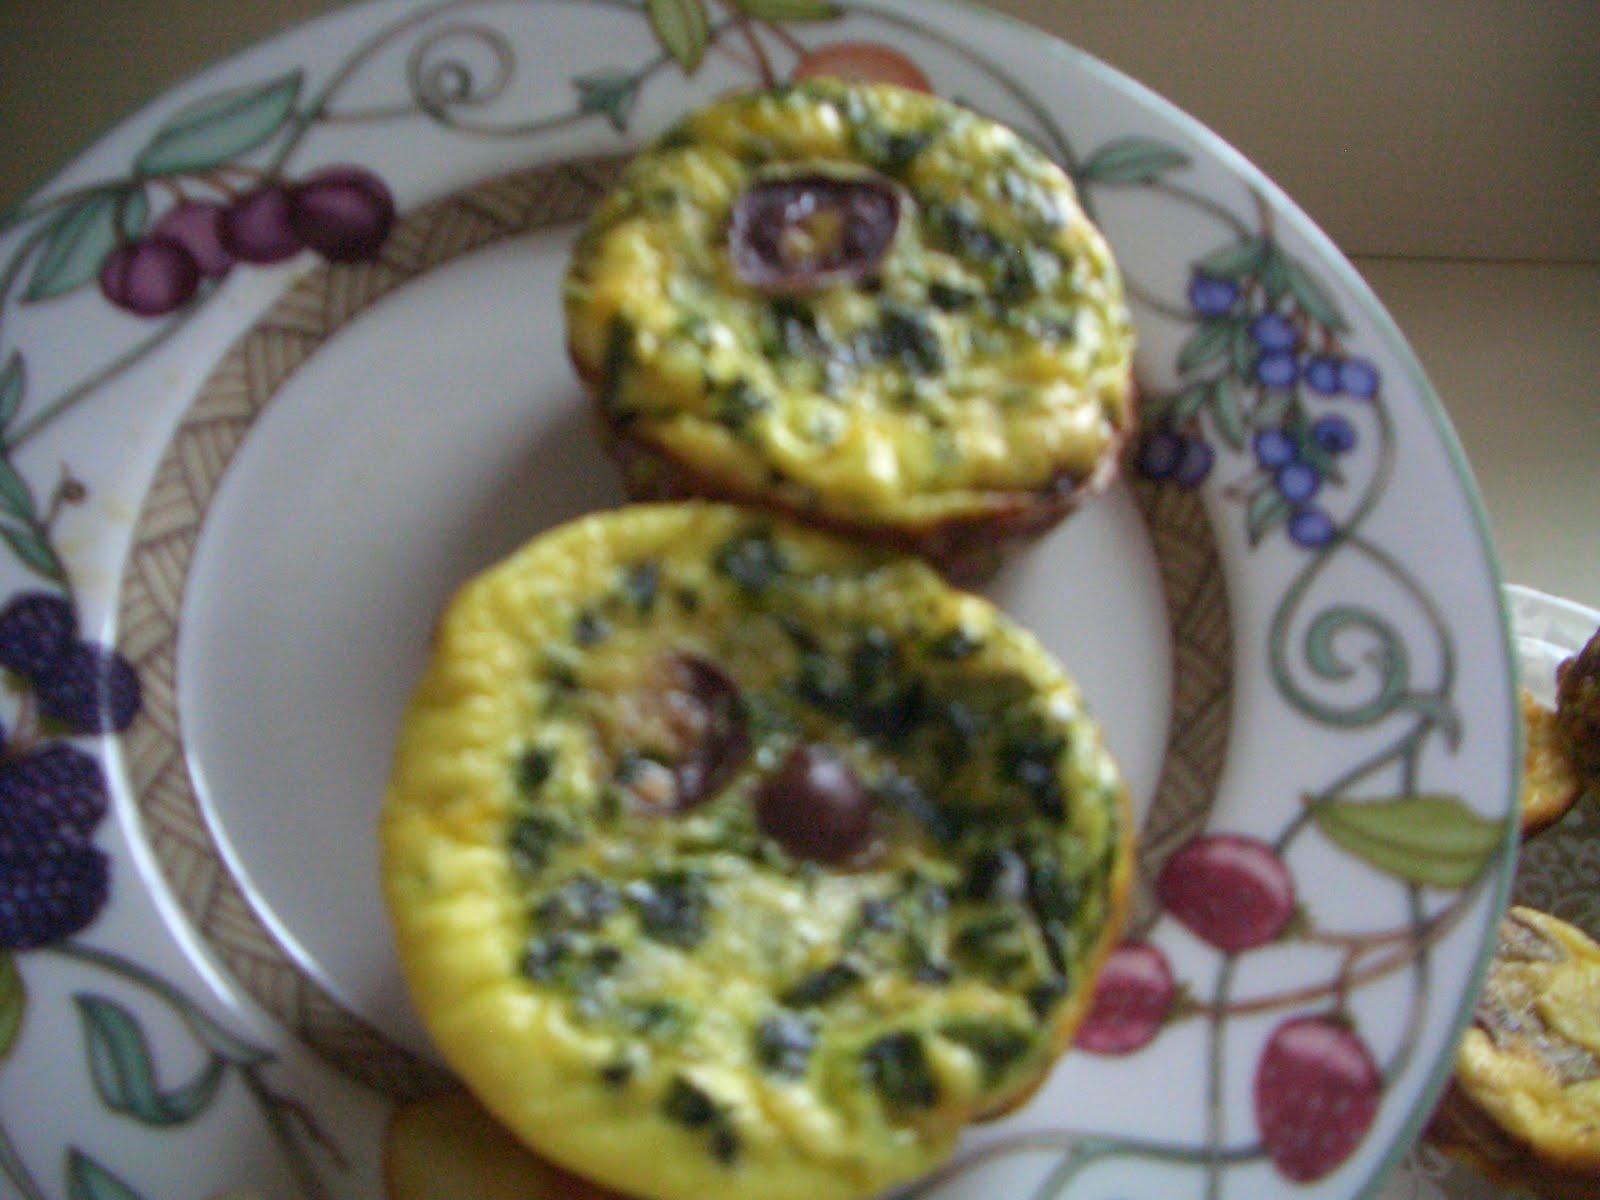 Gluten Free A-Z Blog: Marvelous Mini Quiches